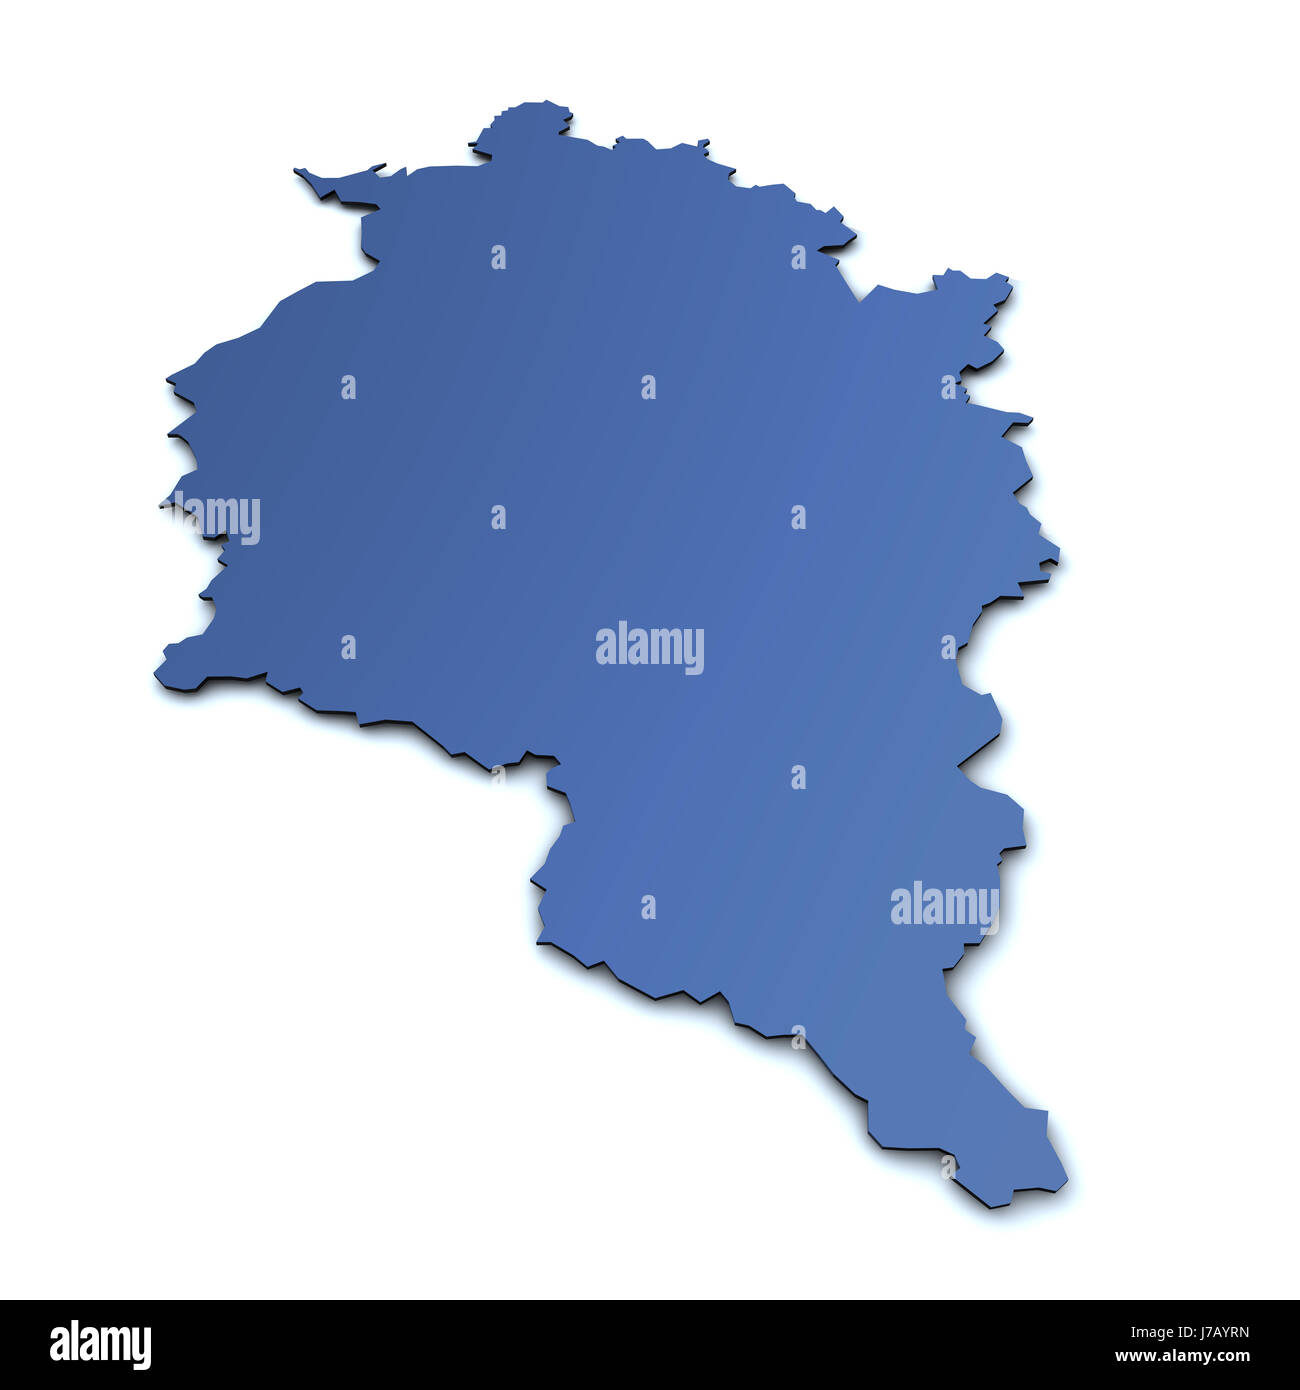 austrians europe card European Union joining atlas map of ...